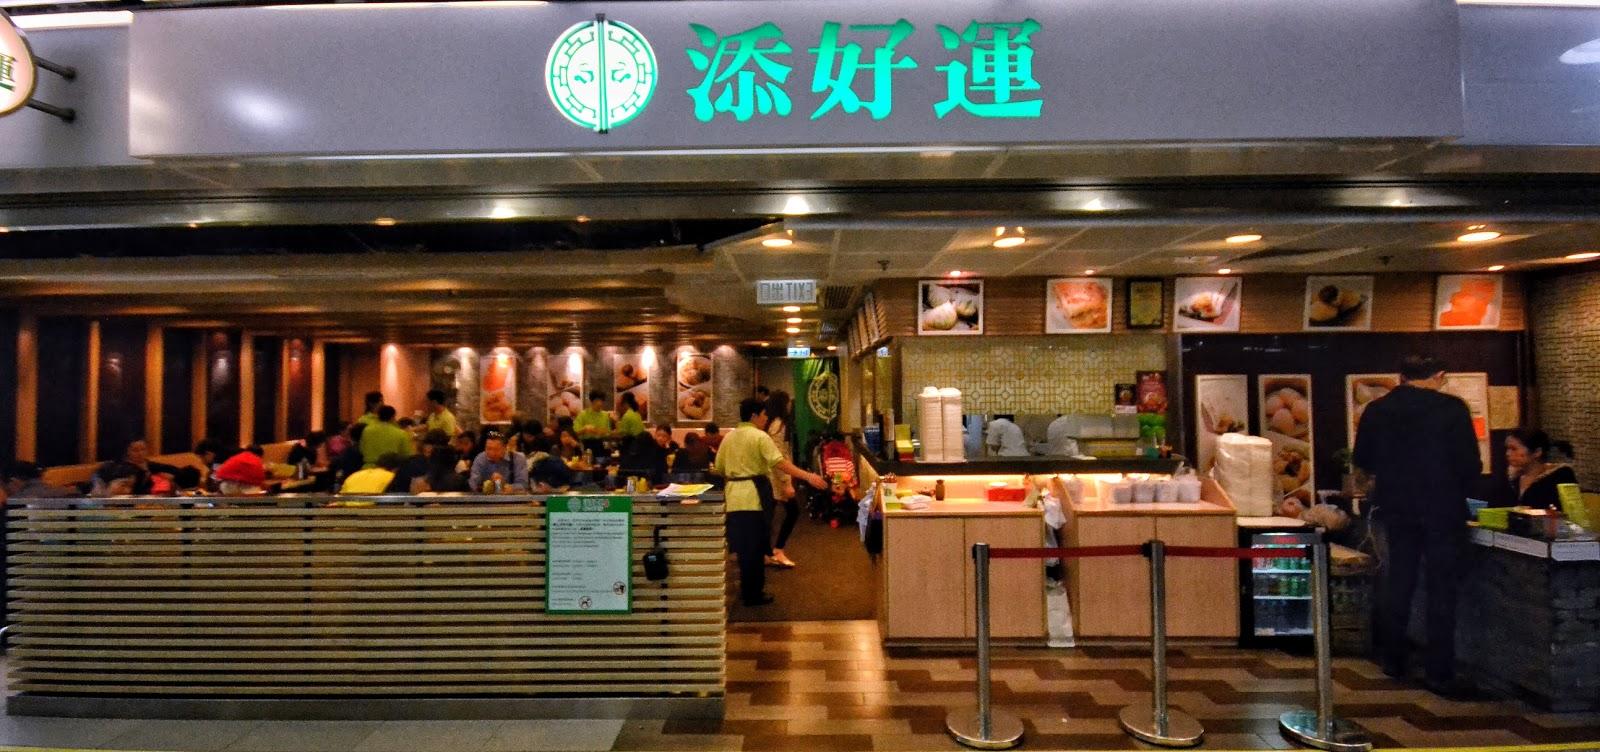 TIM HO WAN IFC Central Hong Kong exterior